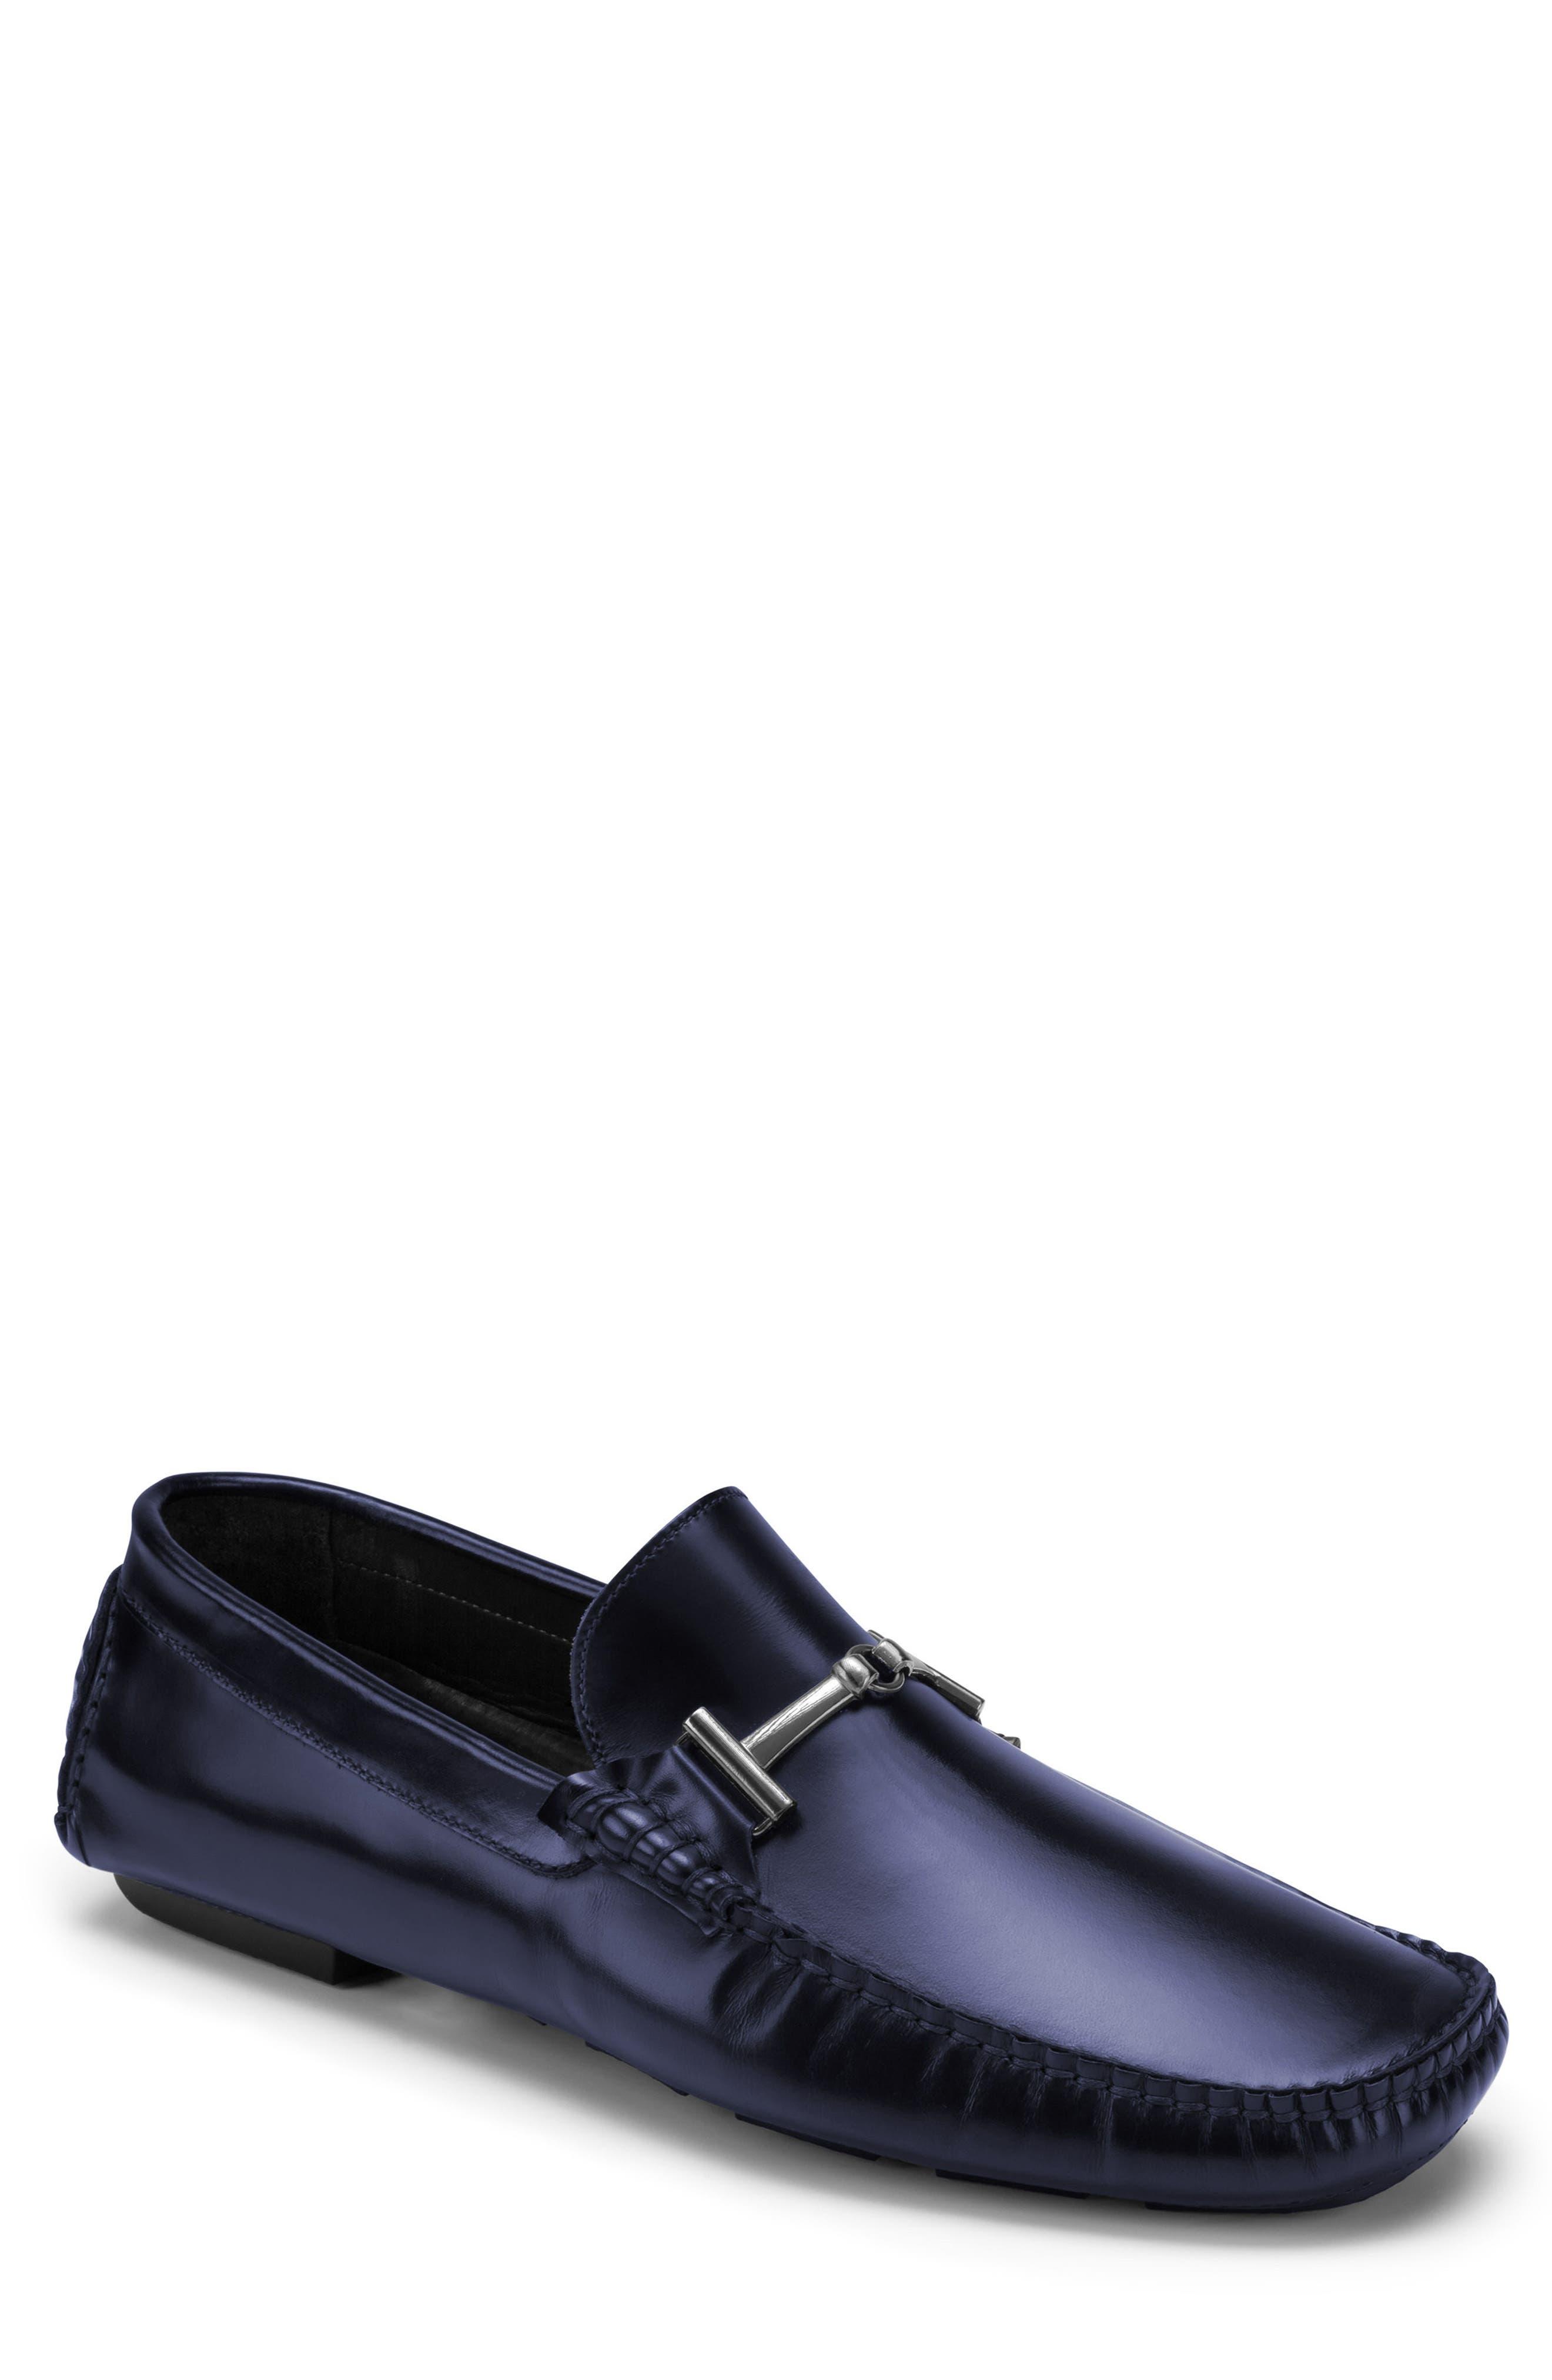 Alternate Image 1 Selected - Bugatchi St. Tropez Driving Shoe (Men)